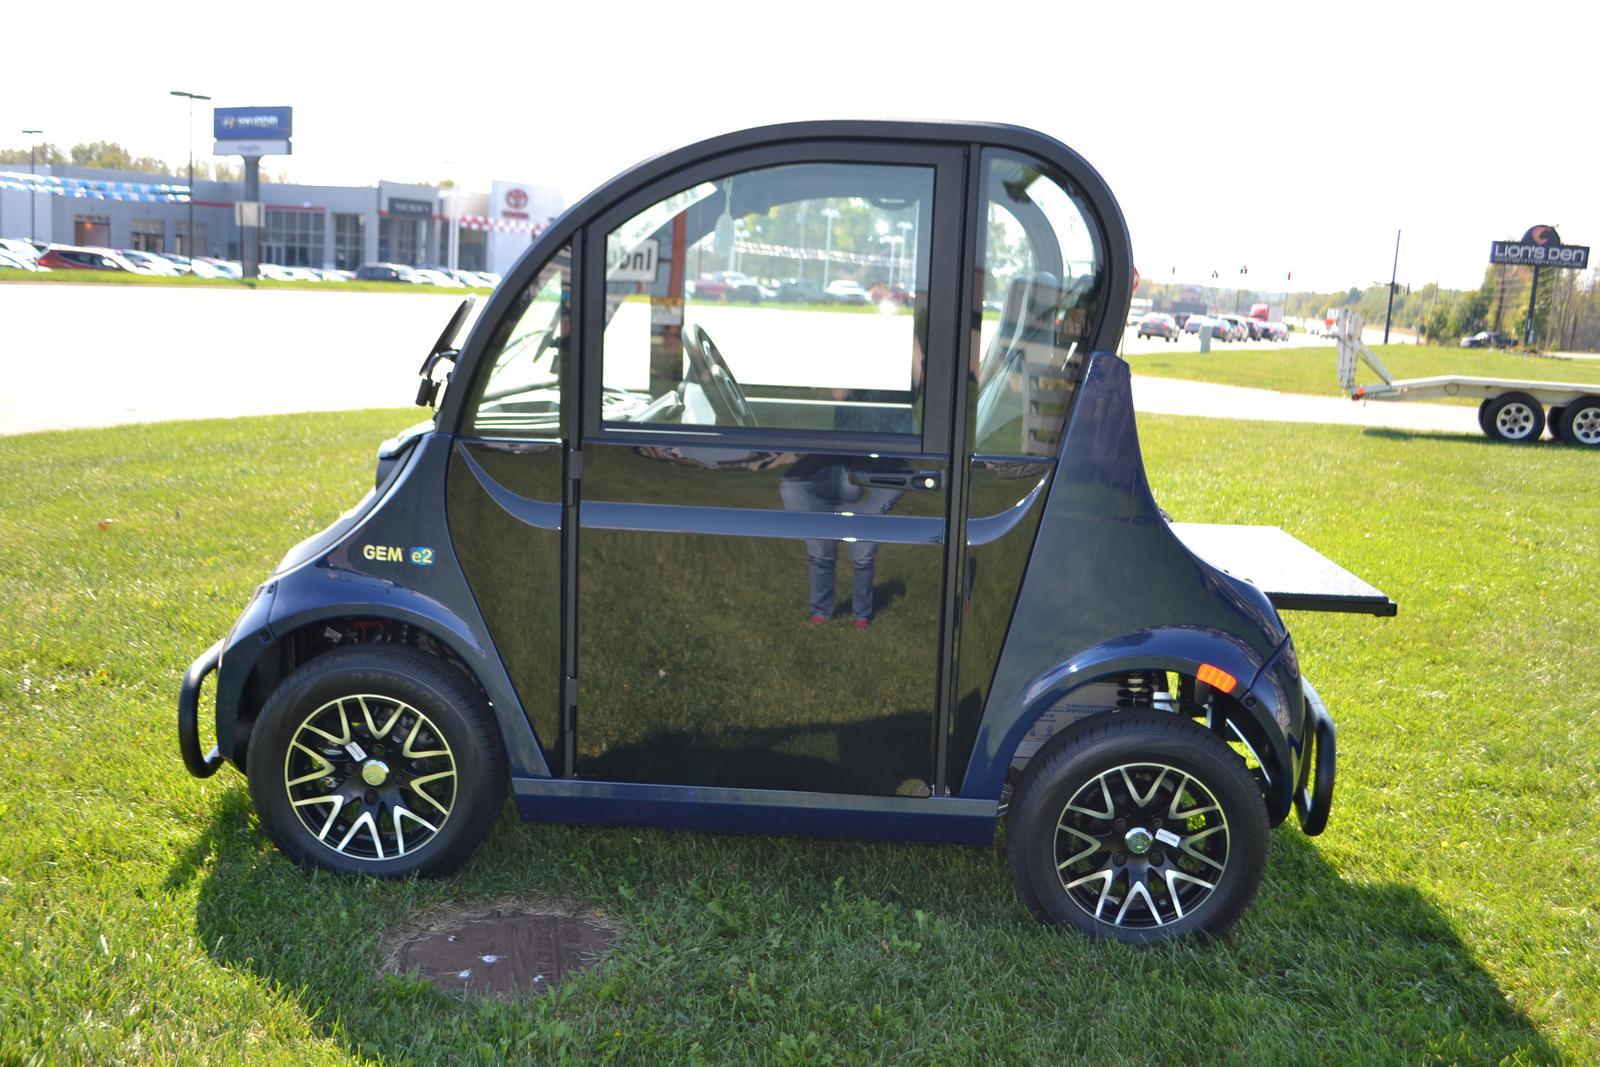 Gem Car For Sale >> 2017 Gem E2 For Sale In Heath Oh Mid Ohio Golf Car Inc Heath Oh